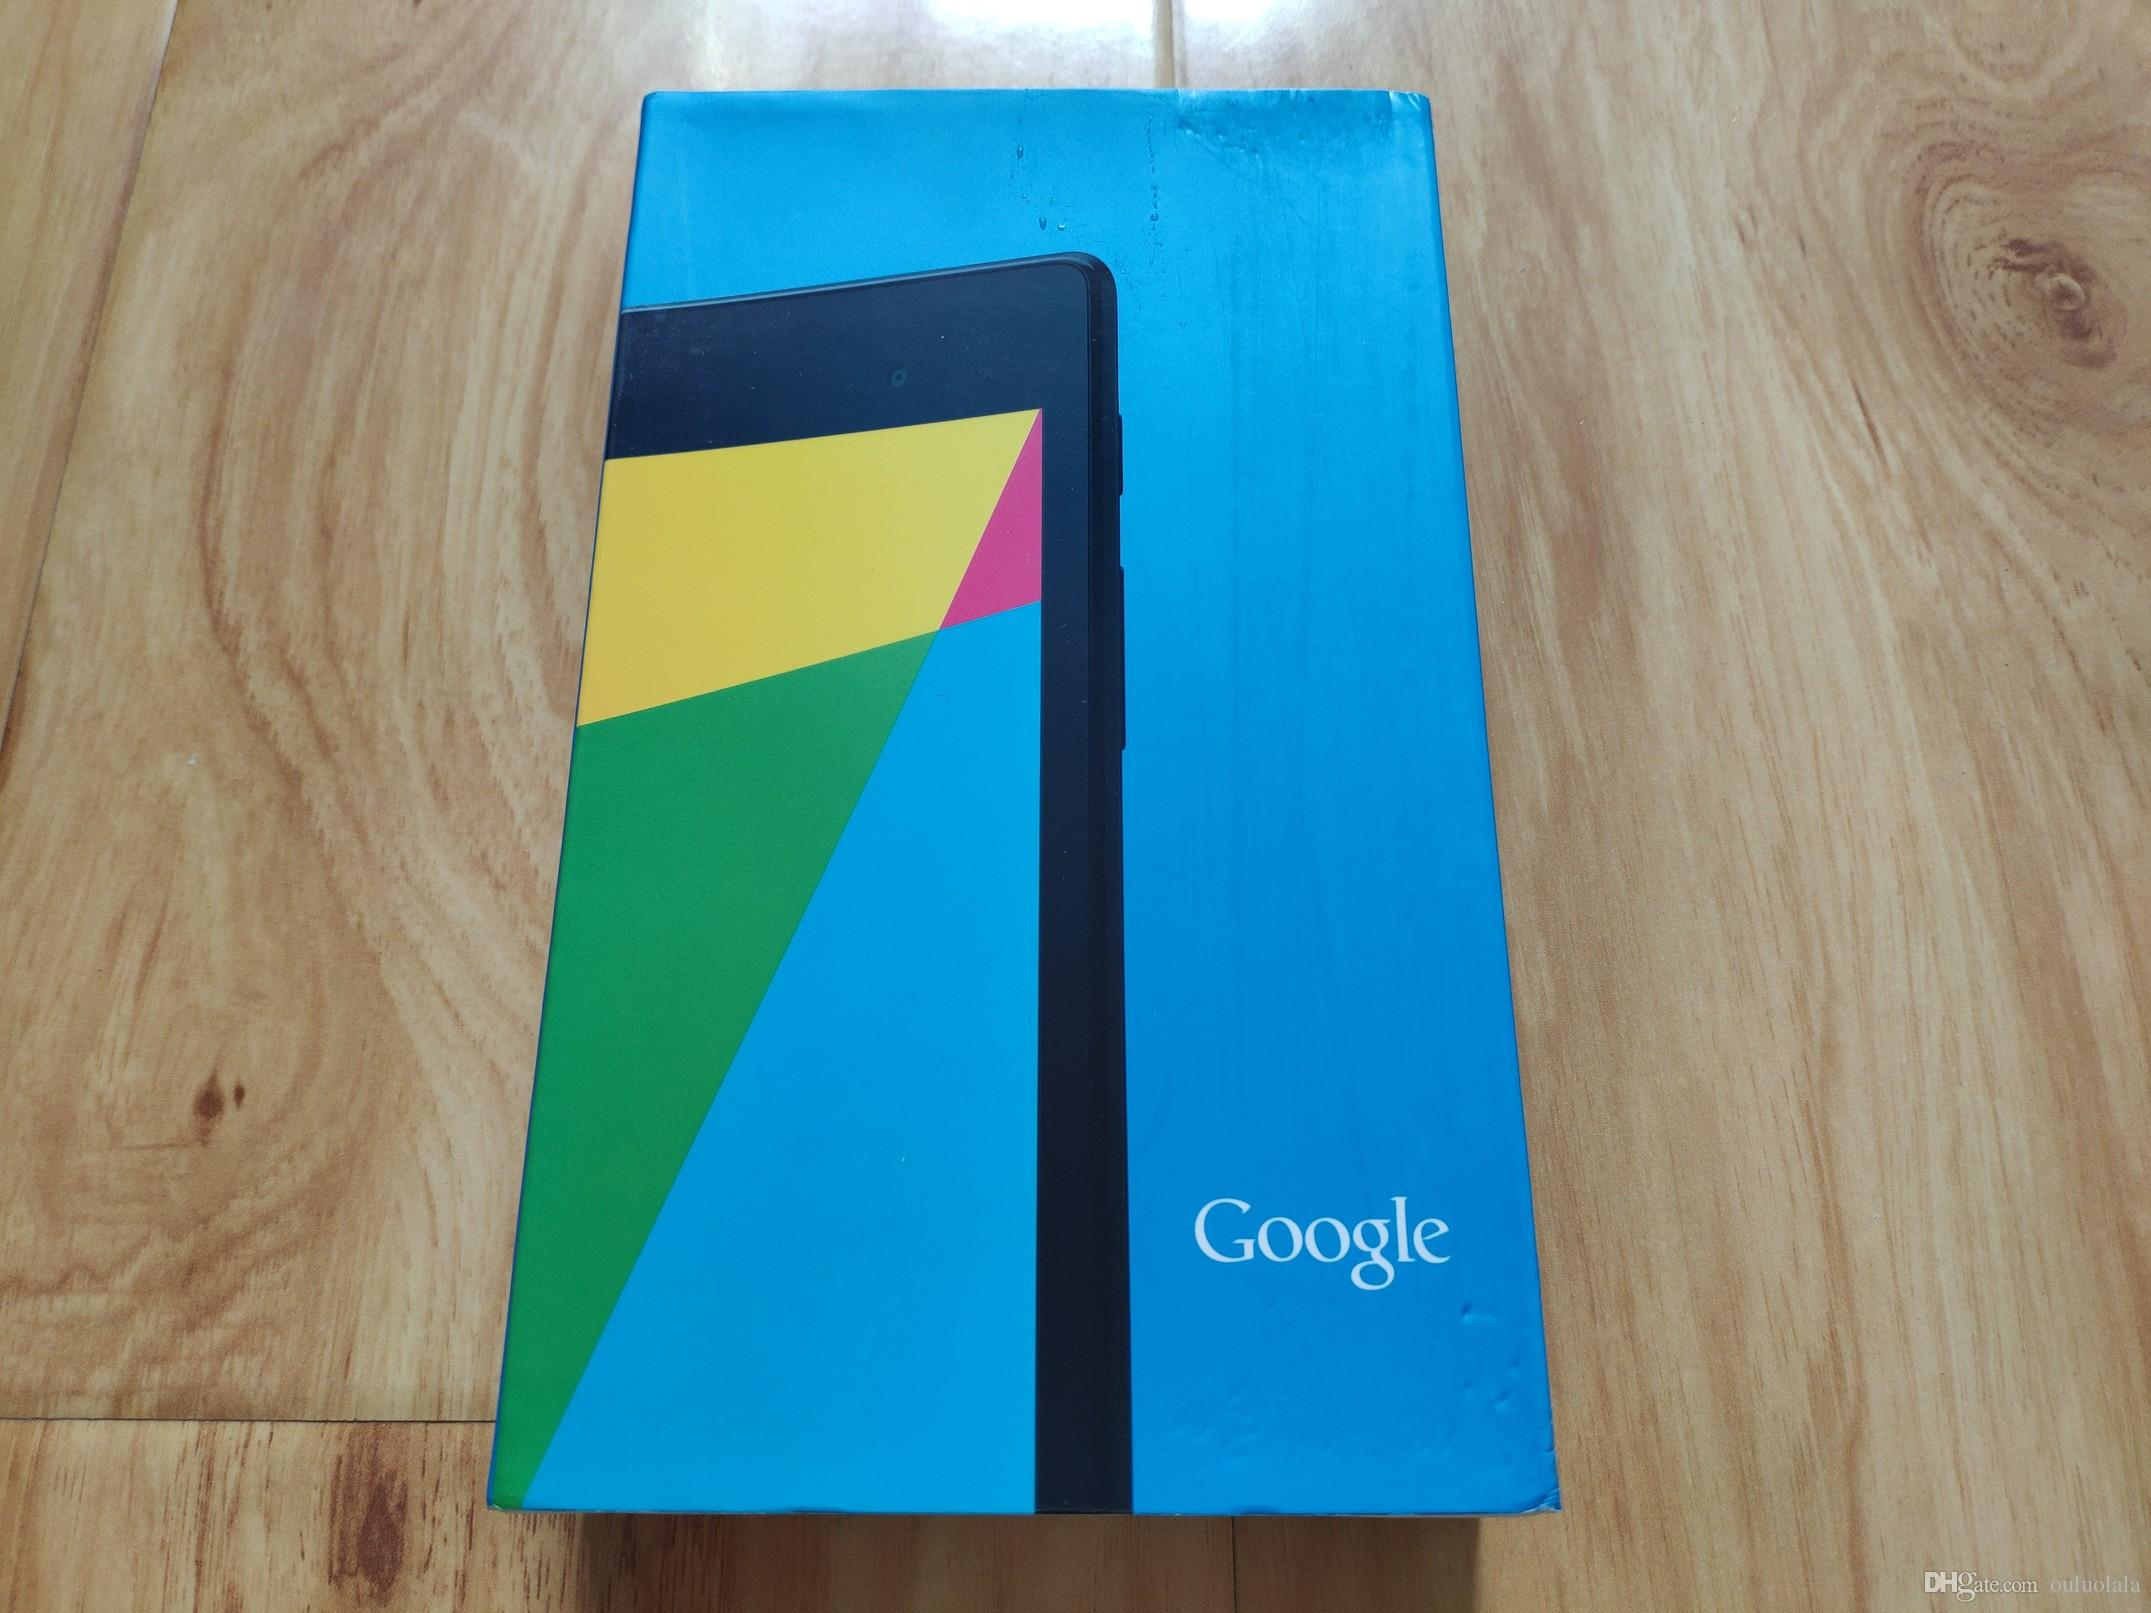 Brand New Google Nexus 7 (2nd Generation) Tablet PC 16GB, 2013 WiFi 7 inch - Black Original packaging in stock